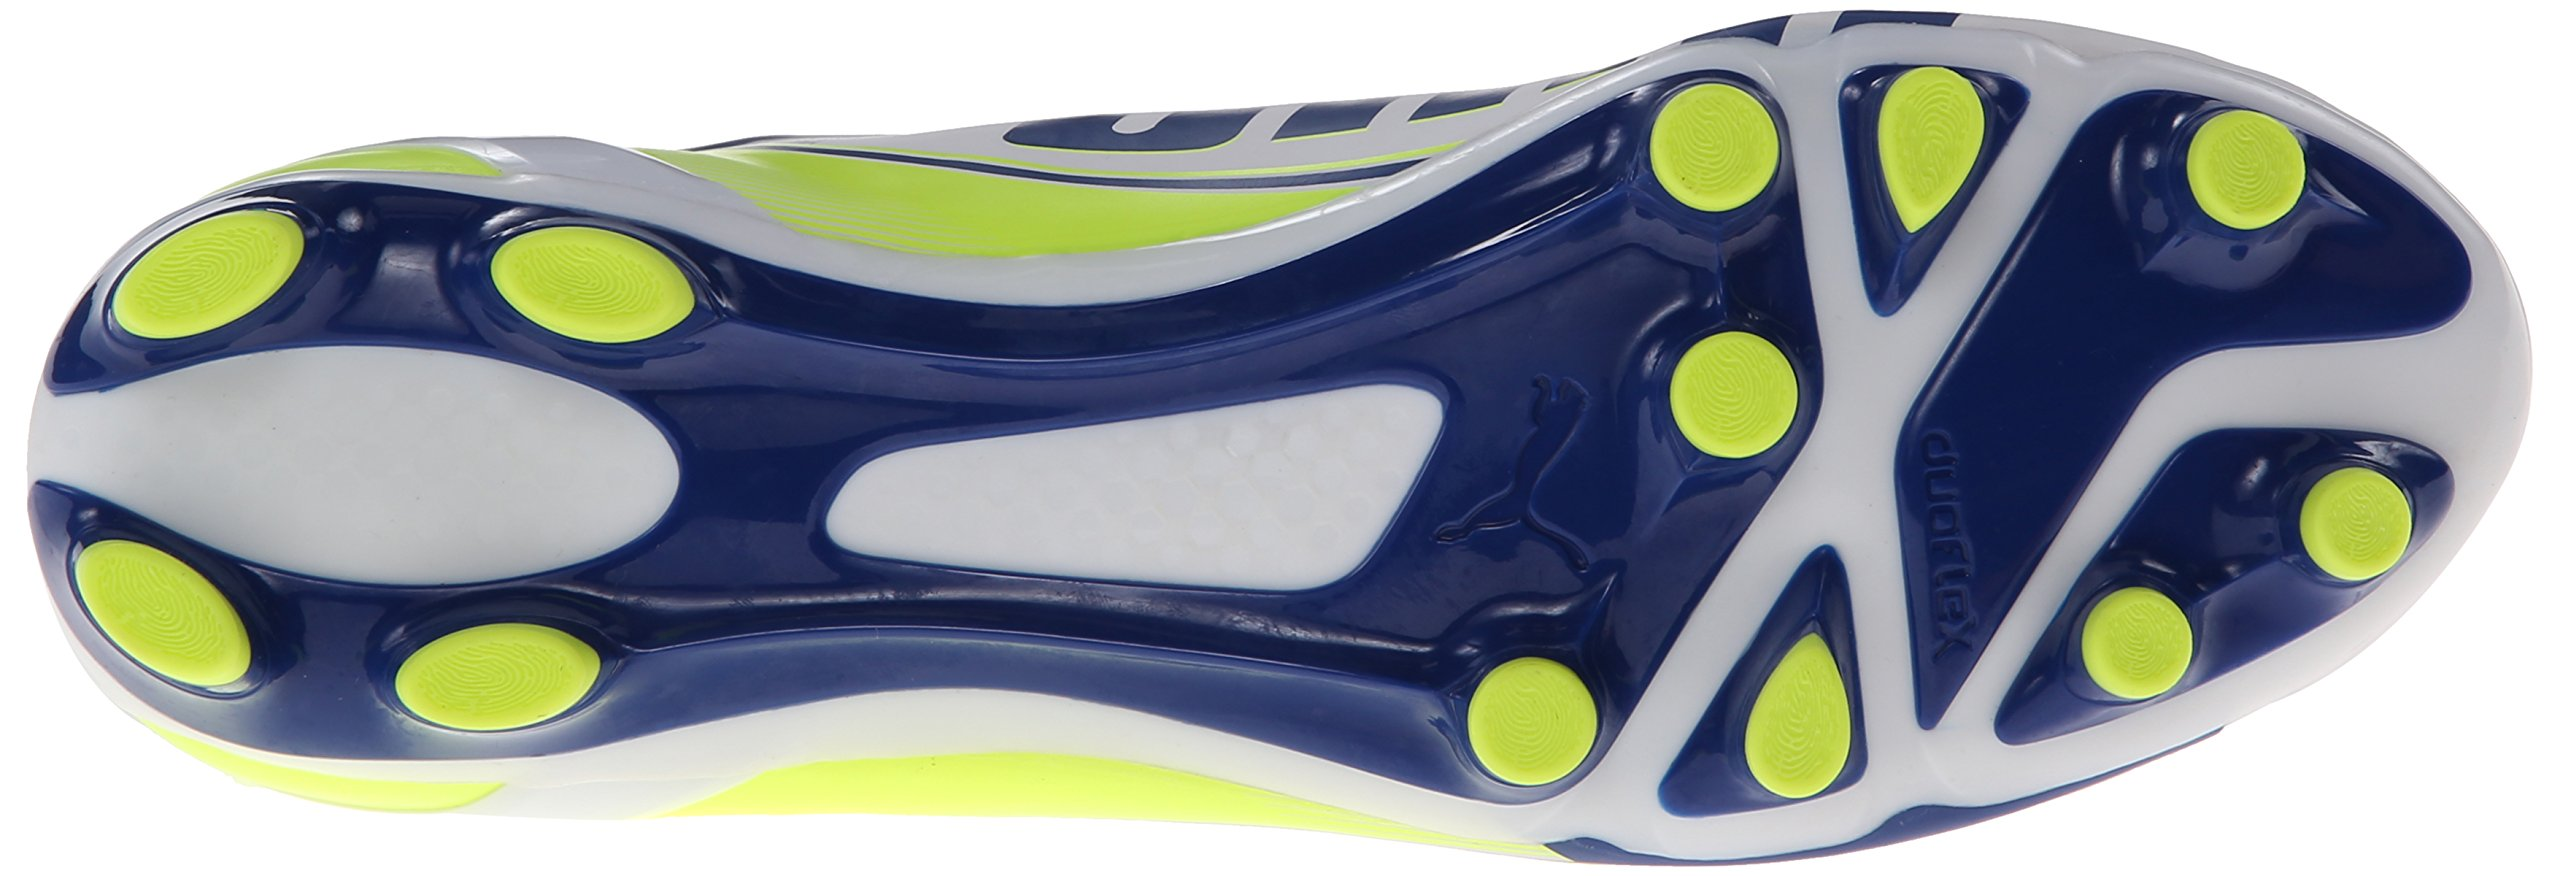 PUMA Women's Evo Speed 3.3 Firm Ground Soccer Shoe,White/Snorkel Blue/Fluorescent Yellow,8 B US by PUMA (Image #3)